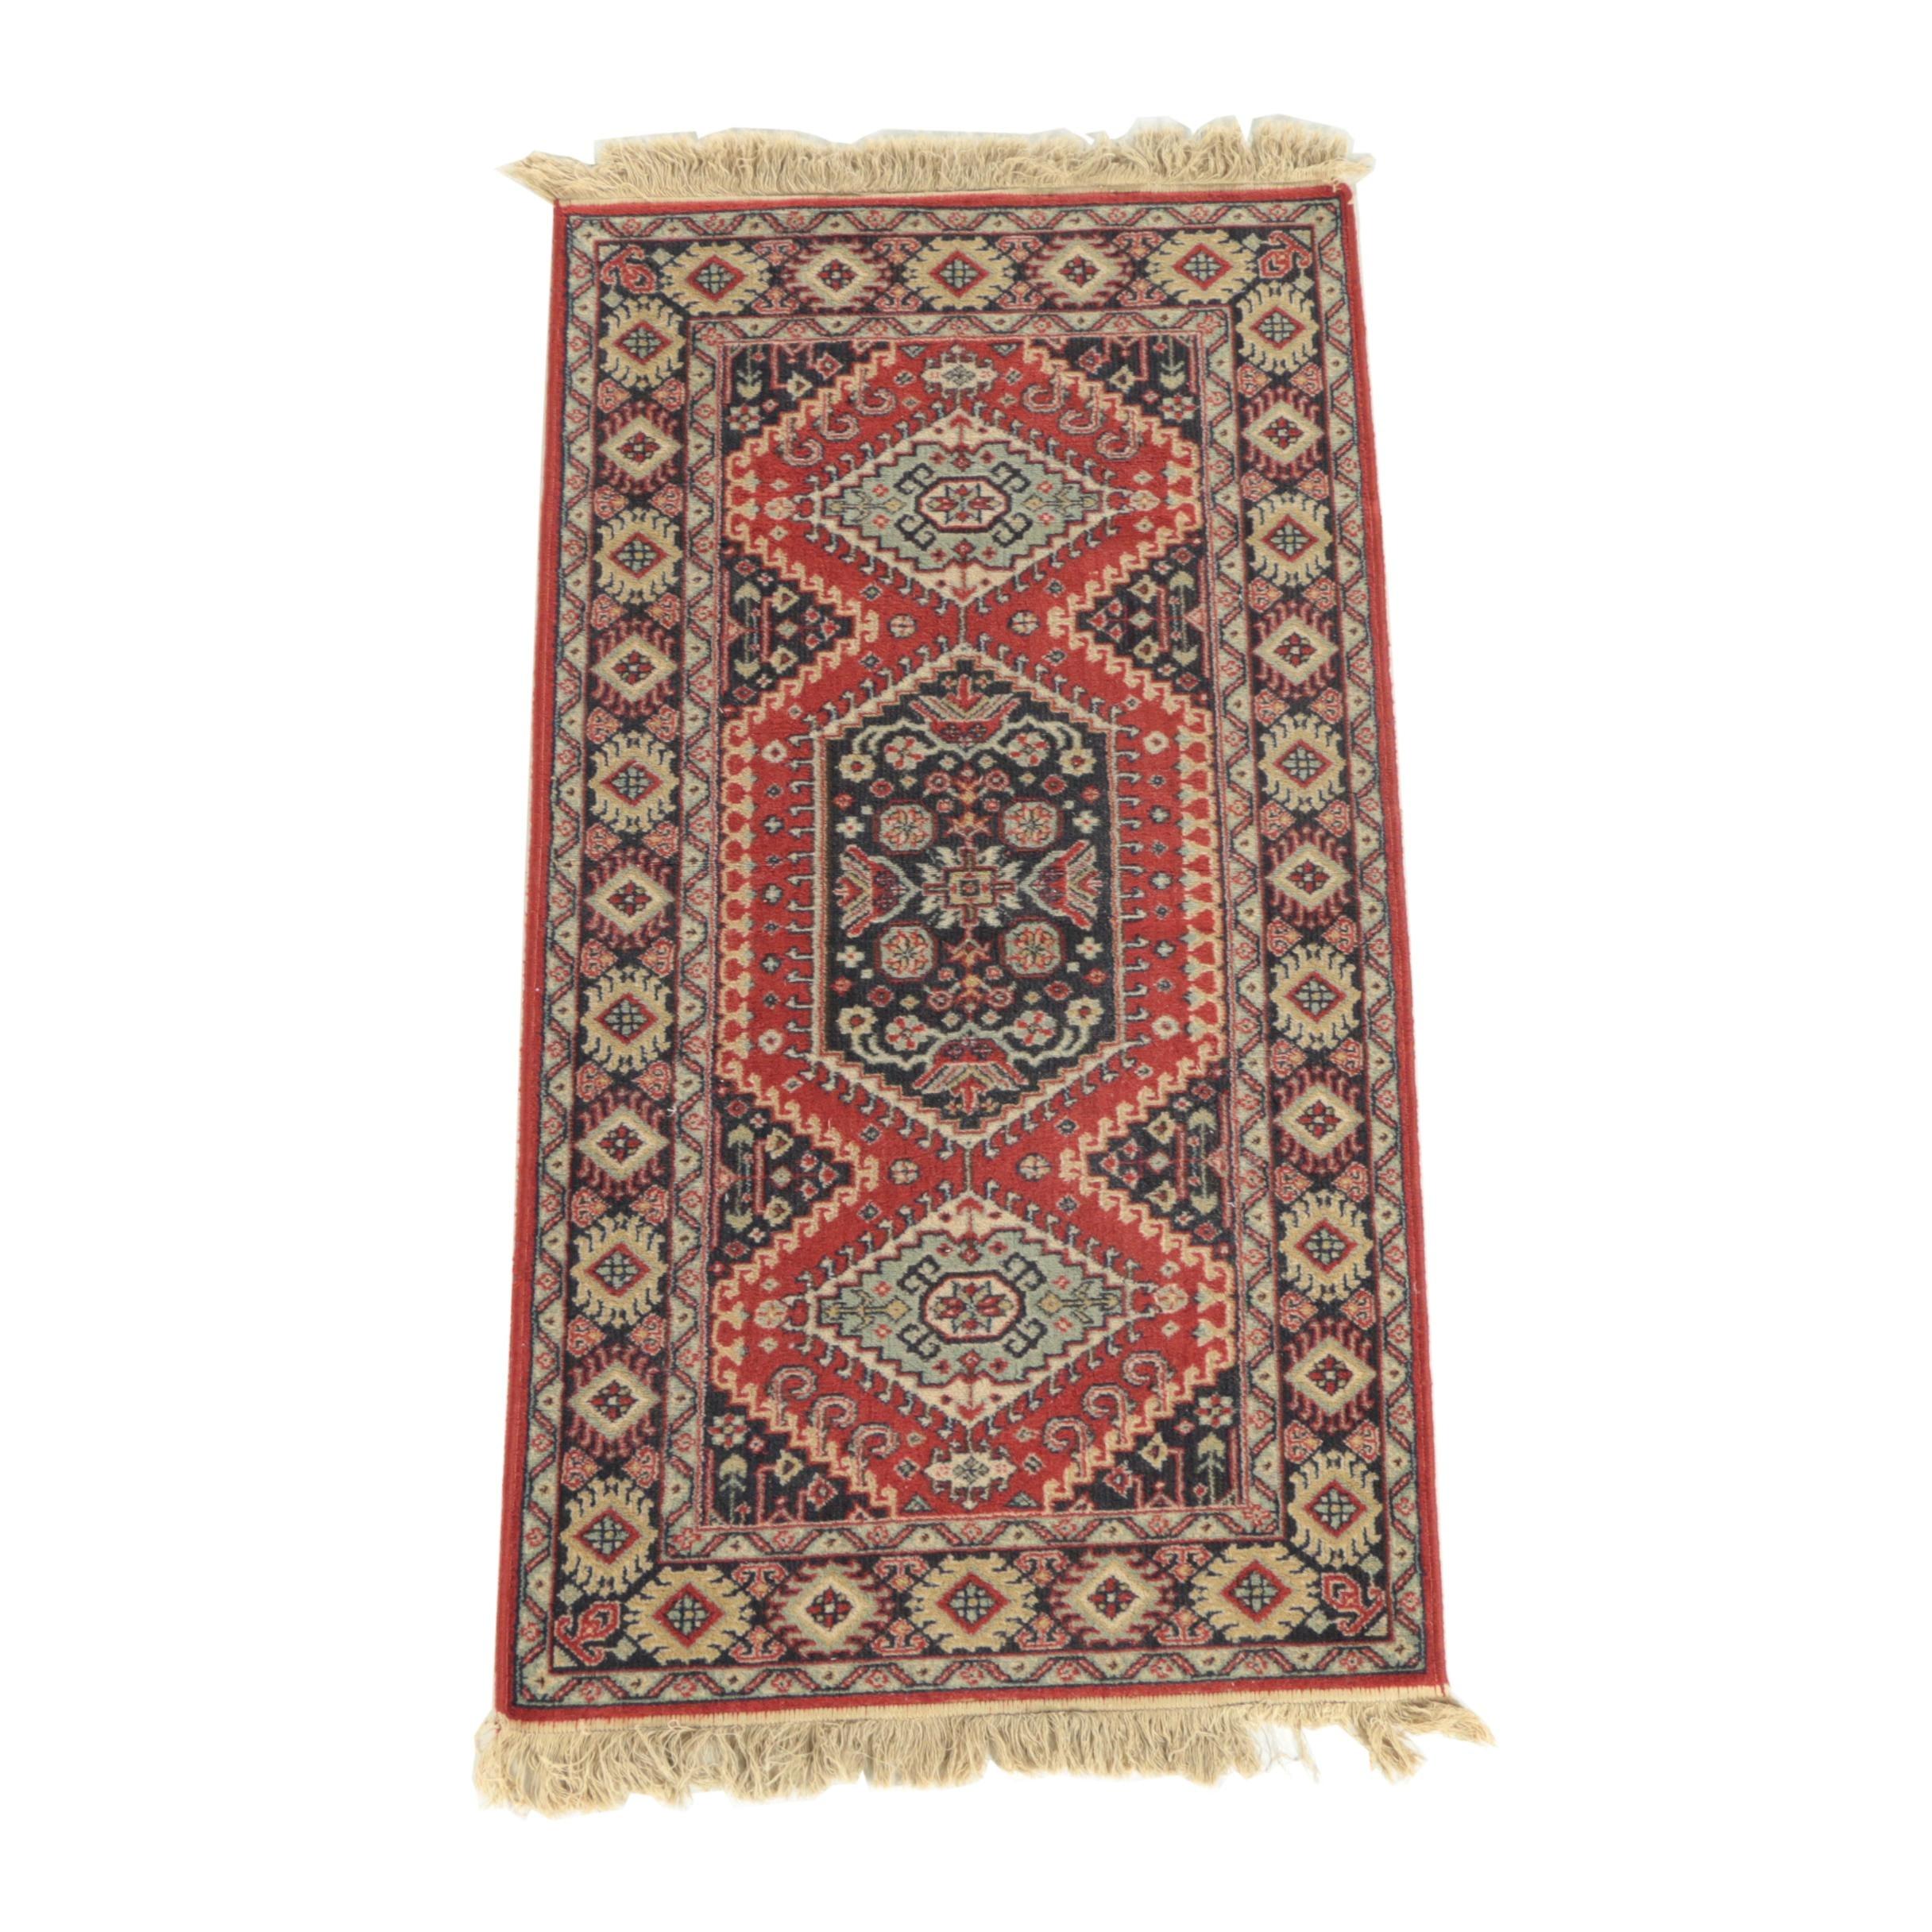 Vintage Power-Loomed Caucasian Kazak Style Wool Accent Rug